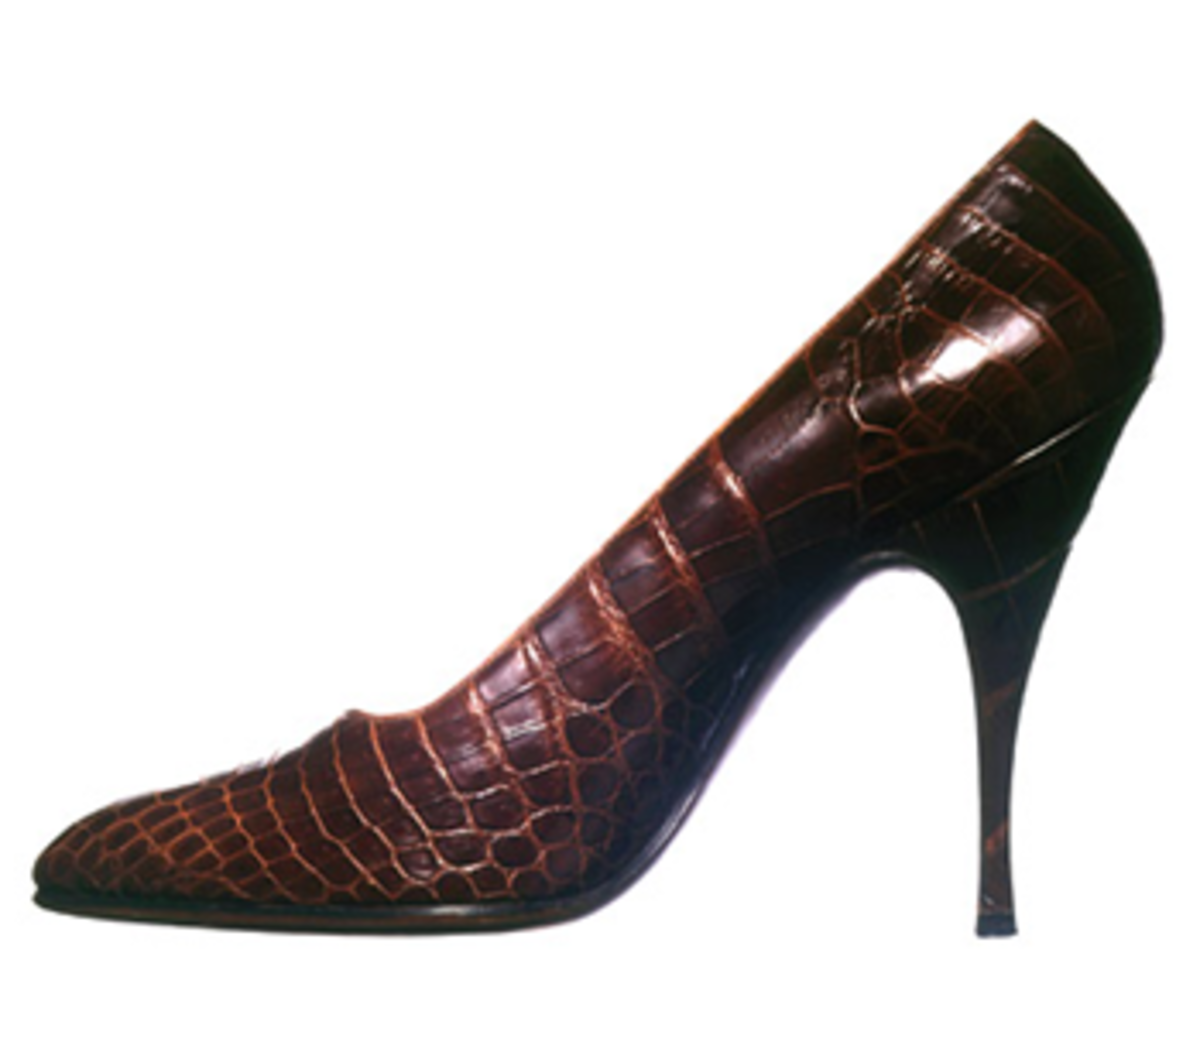 Ferragamo invented the stiletto heel, such as this pair of crocodile stilettos designed for Marilyn Monroe.